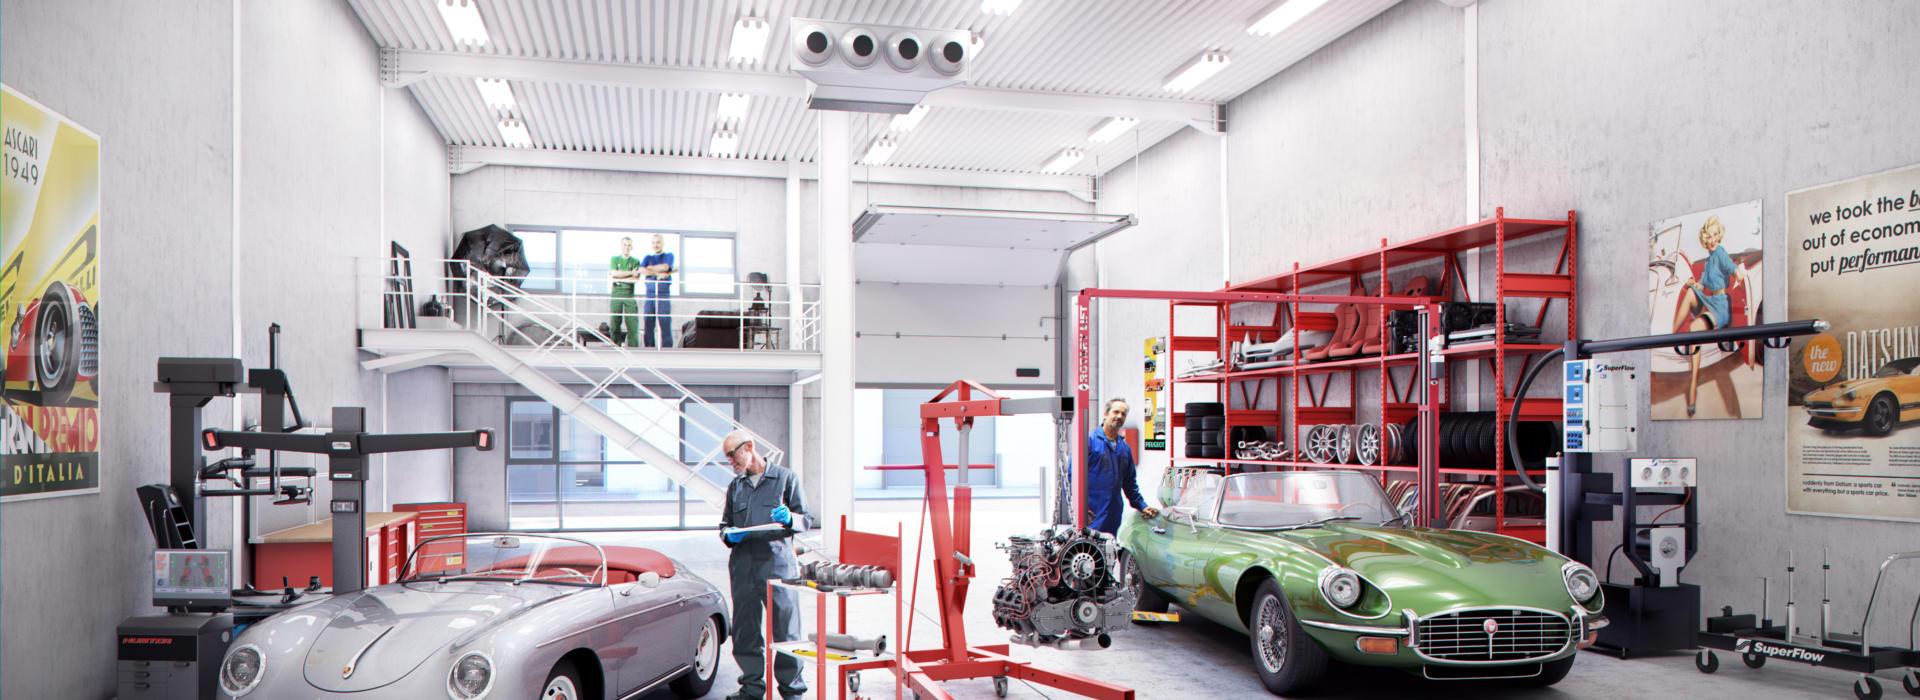 interior_carshop_hooox_blue_v_crop_voor_site